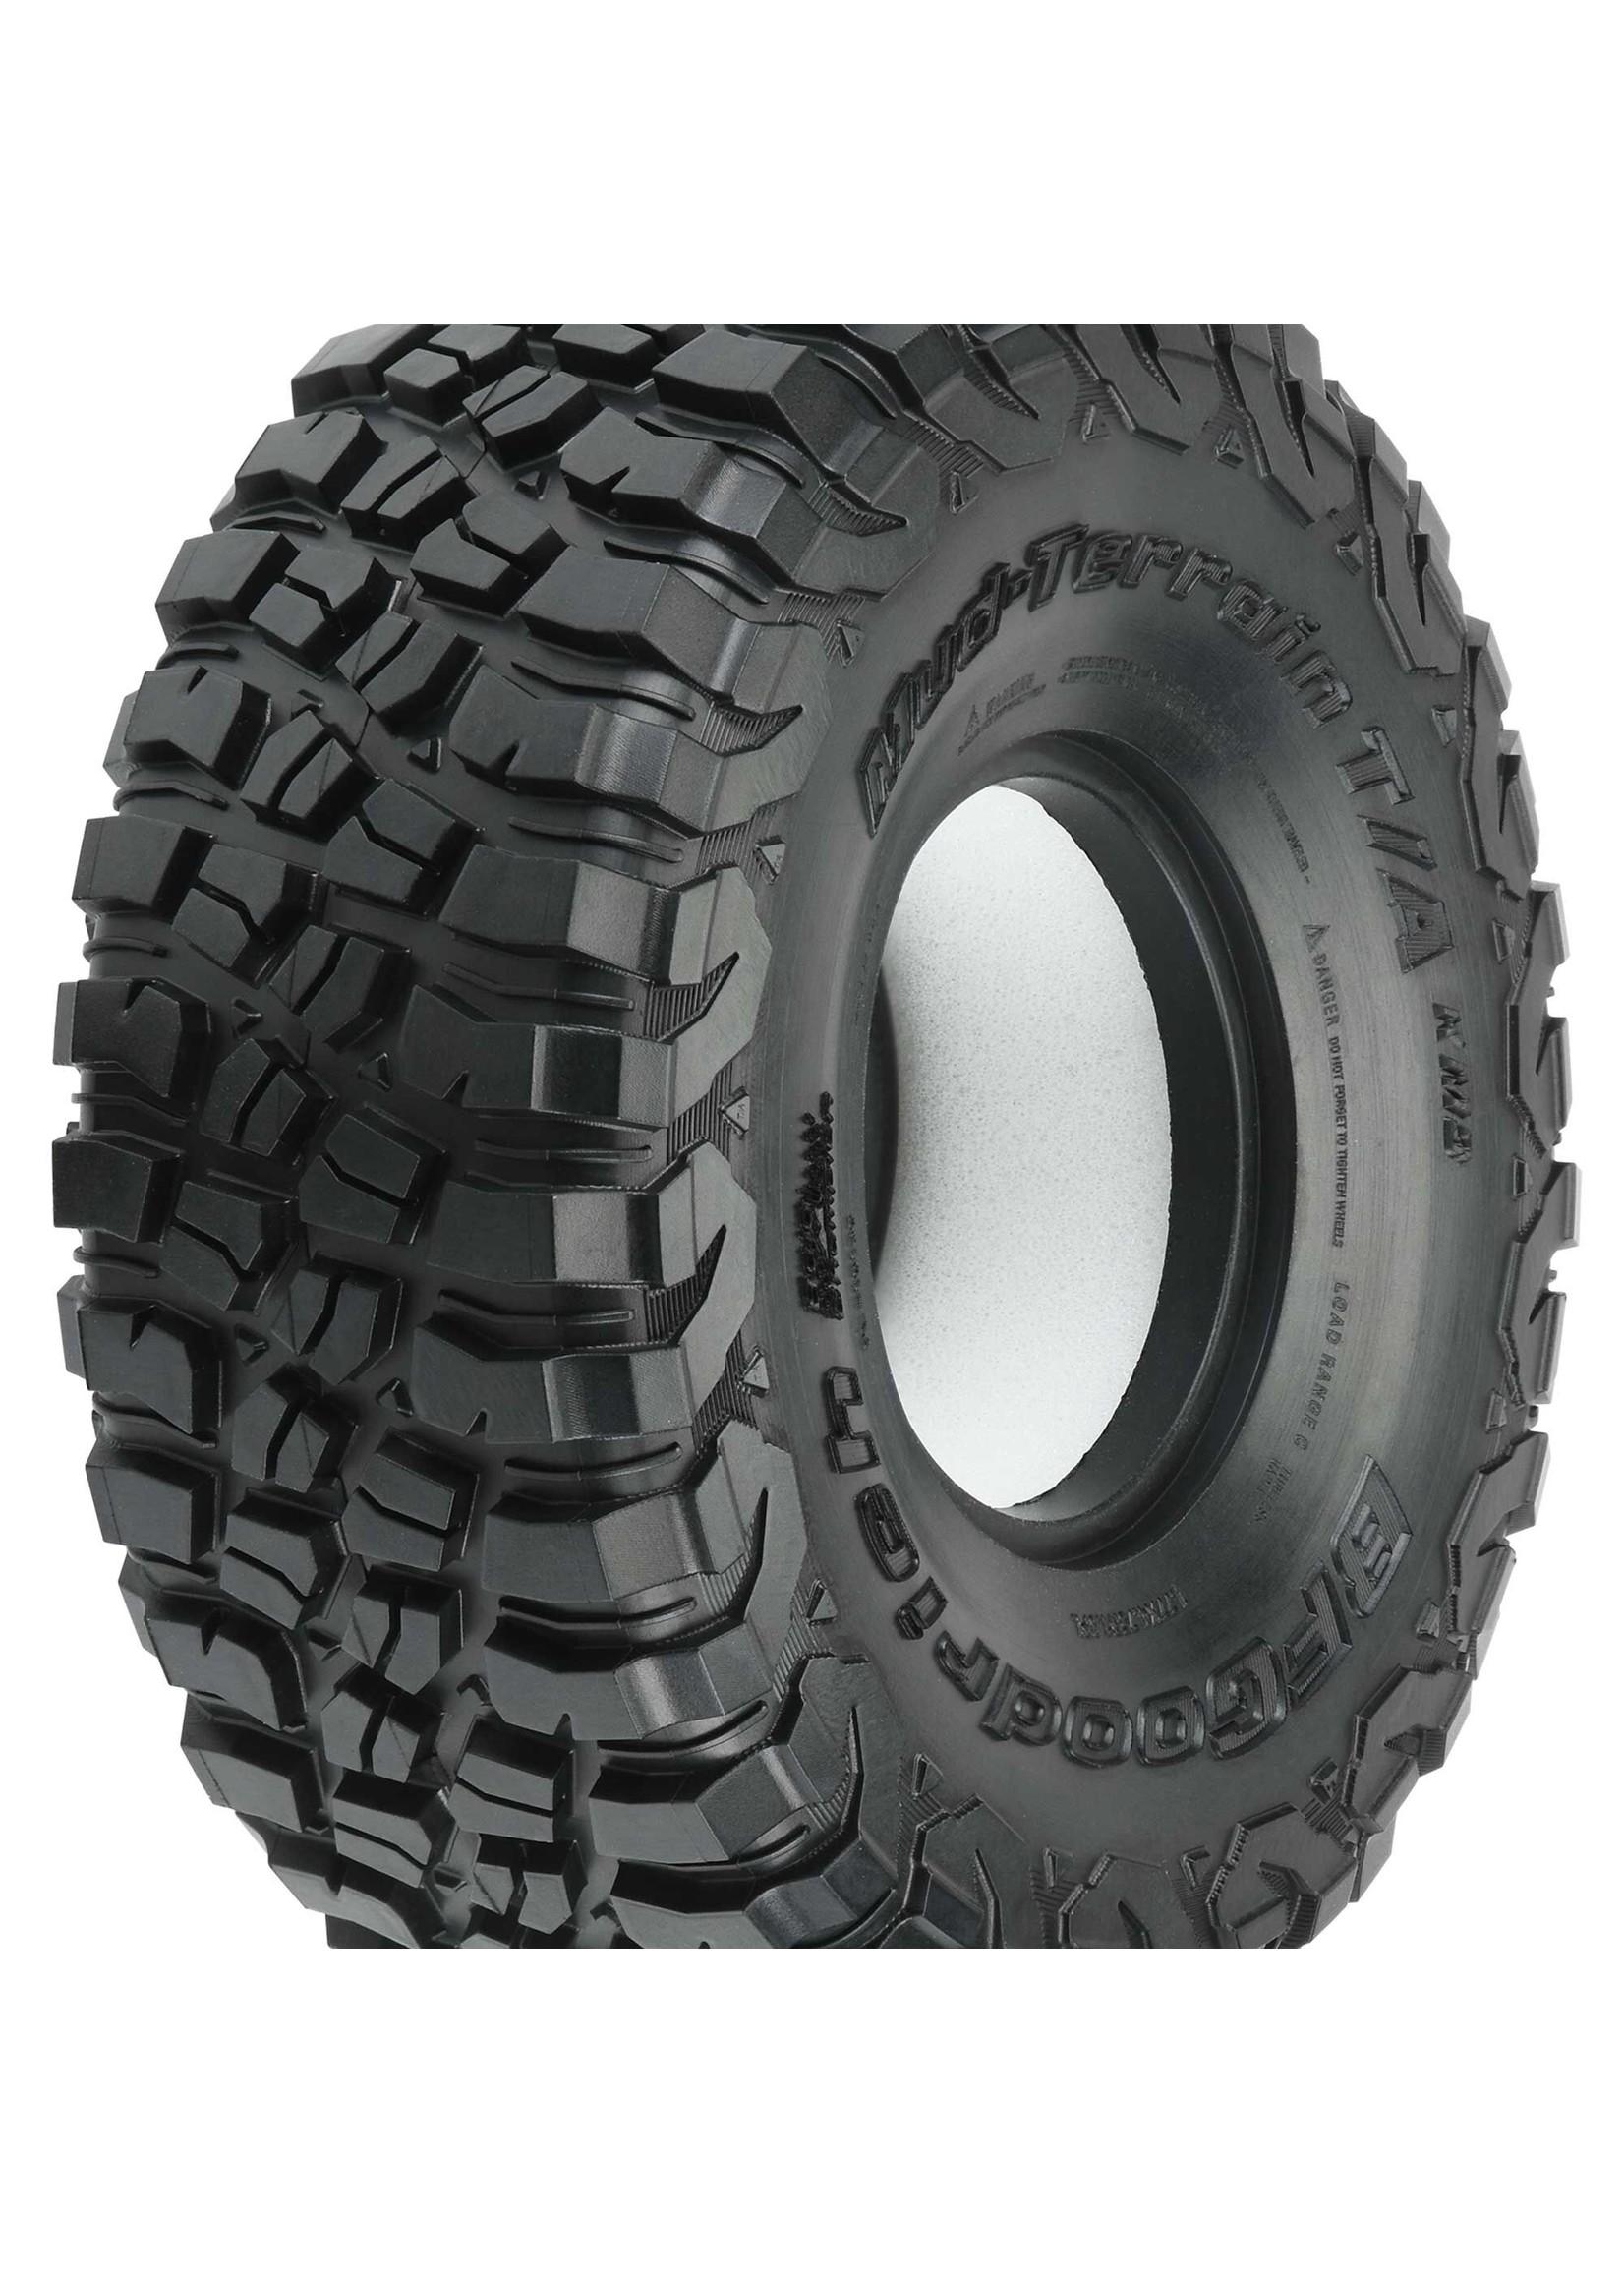 Pro-Line Racing PRO1015014 Pro-Line BFGoodrich Mud-Terrain T/A KM3 1.9 Crawler Tire